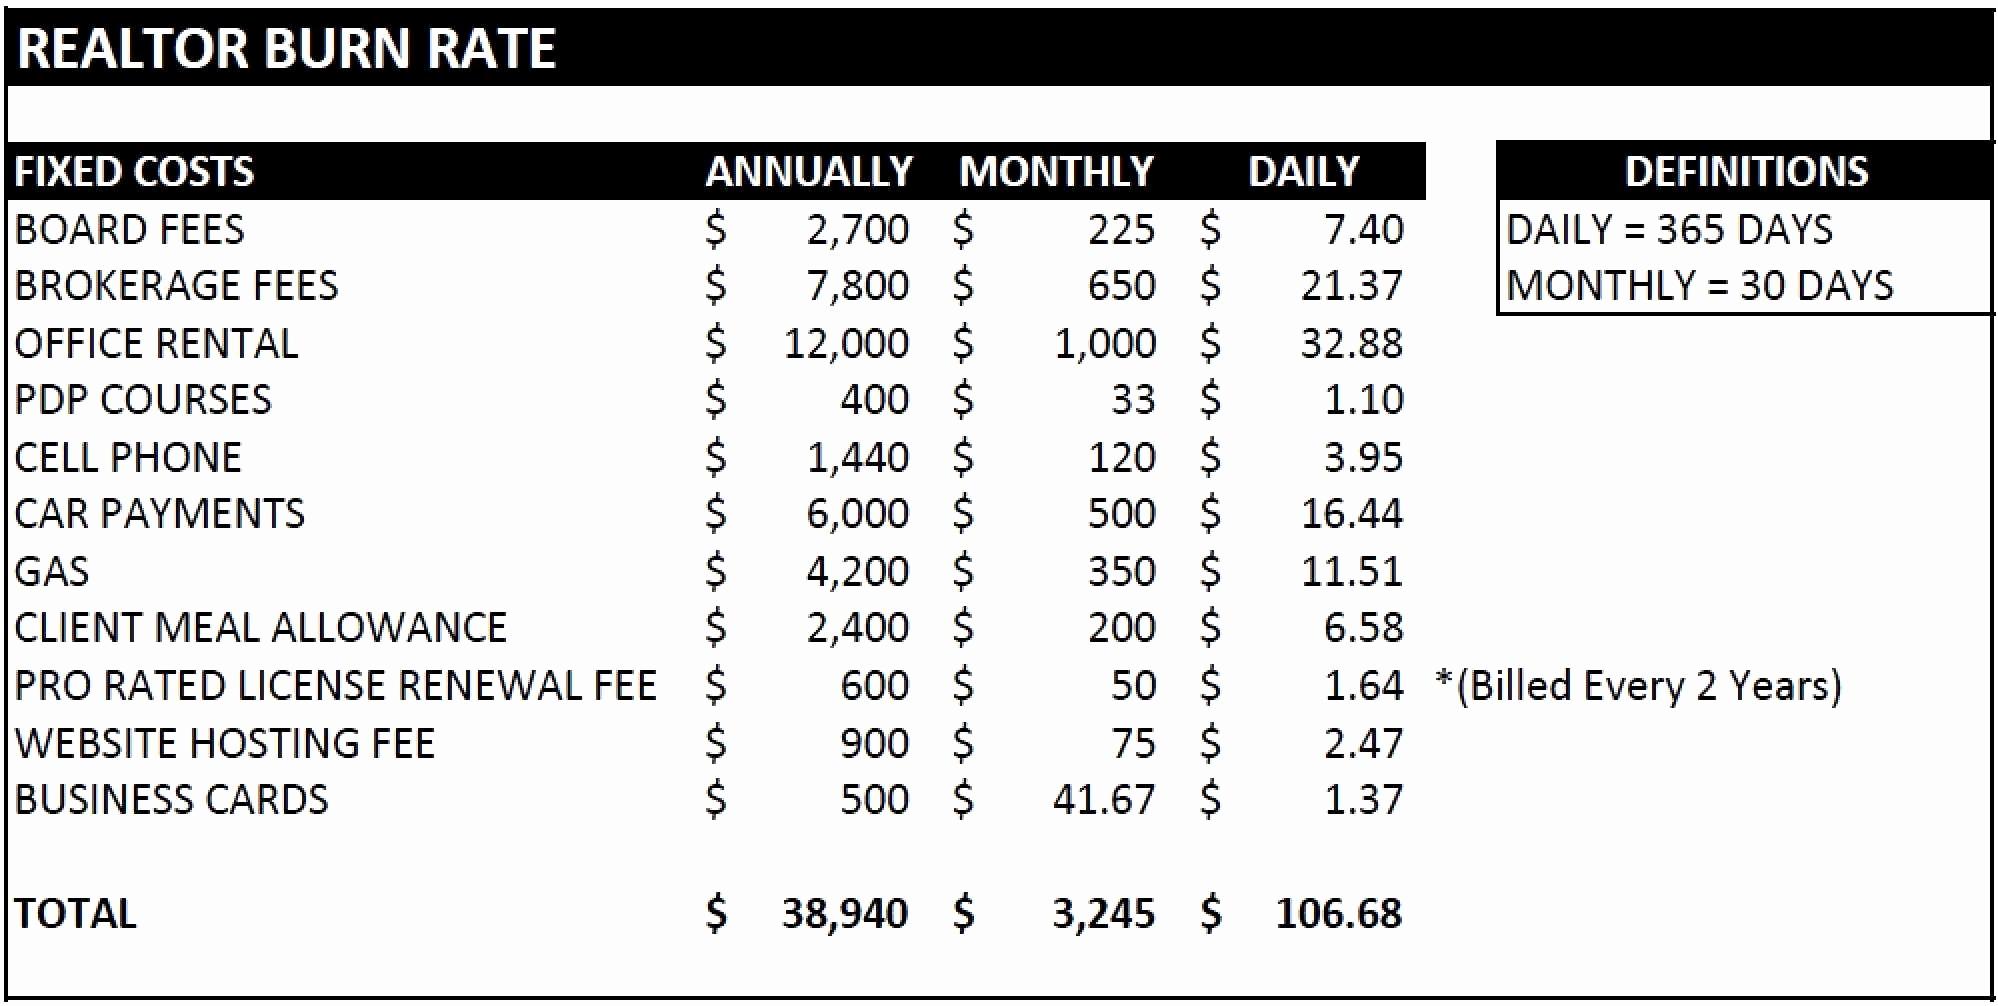 Account Payable Spreadsheet Beautiful Ebay Inventory Spreadsheet and Accounts Payable Spreadsheet Template